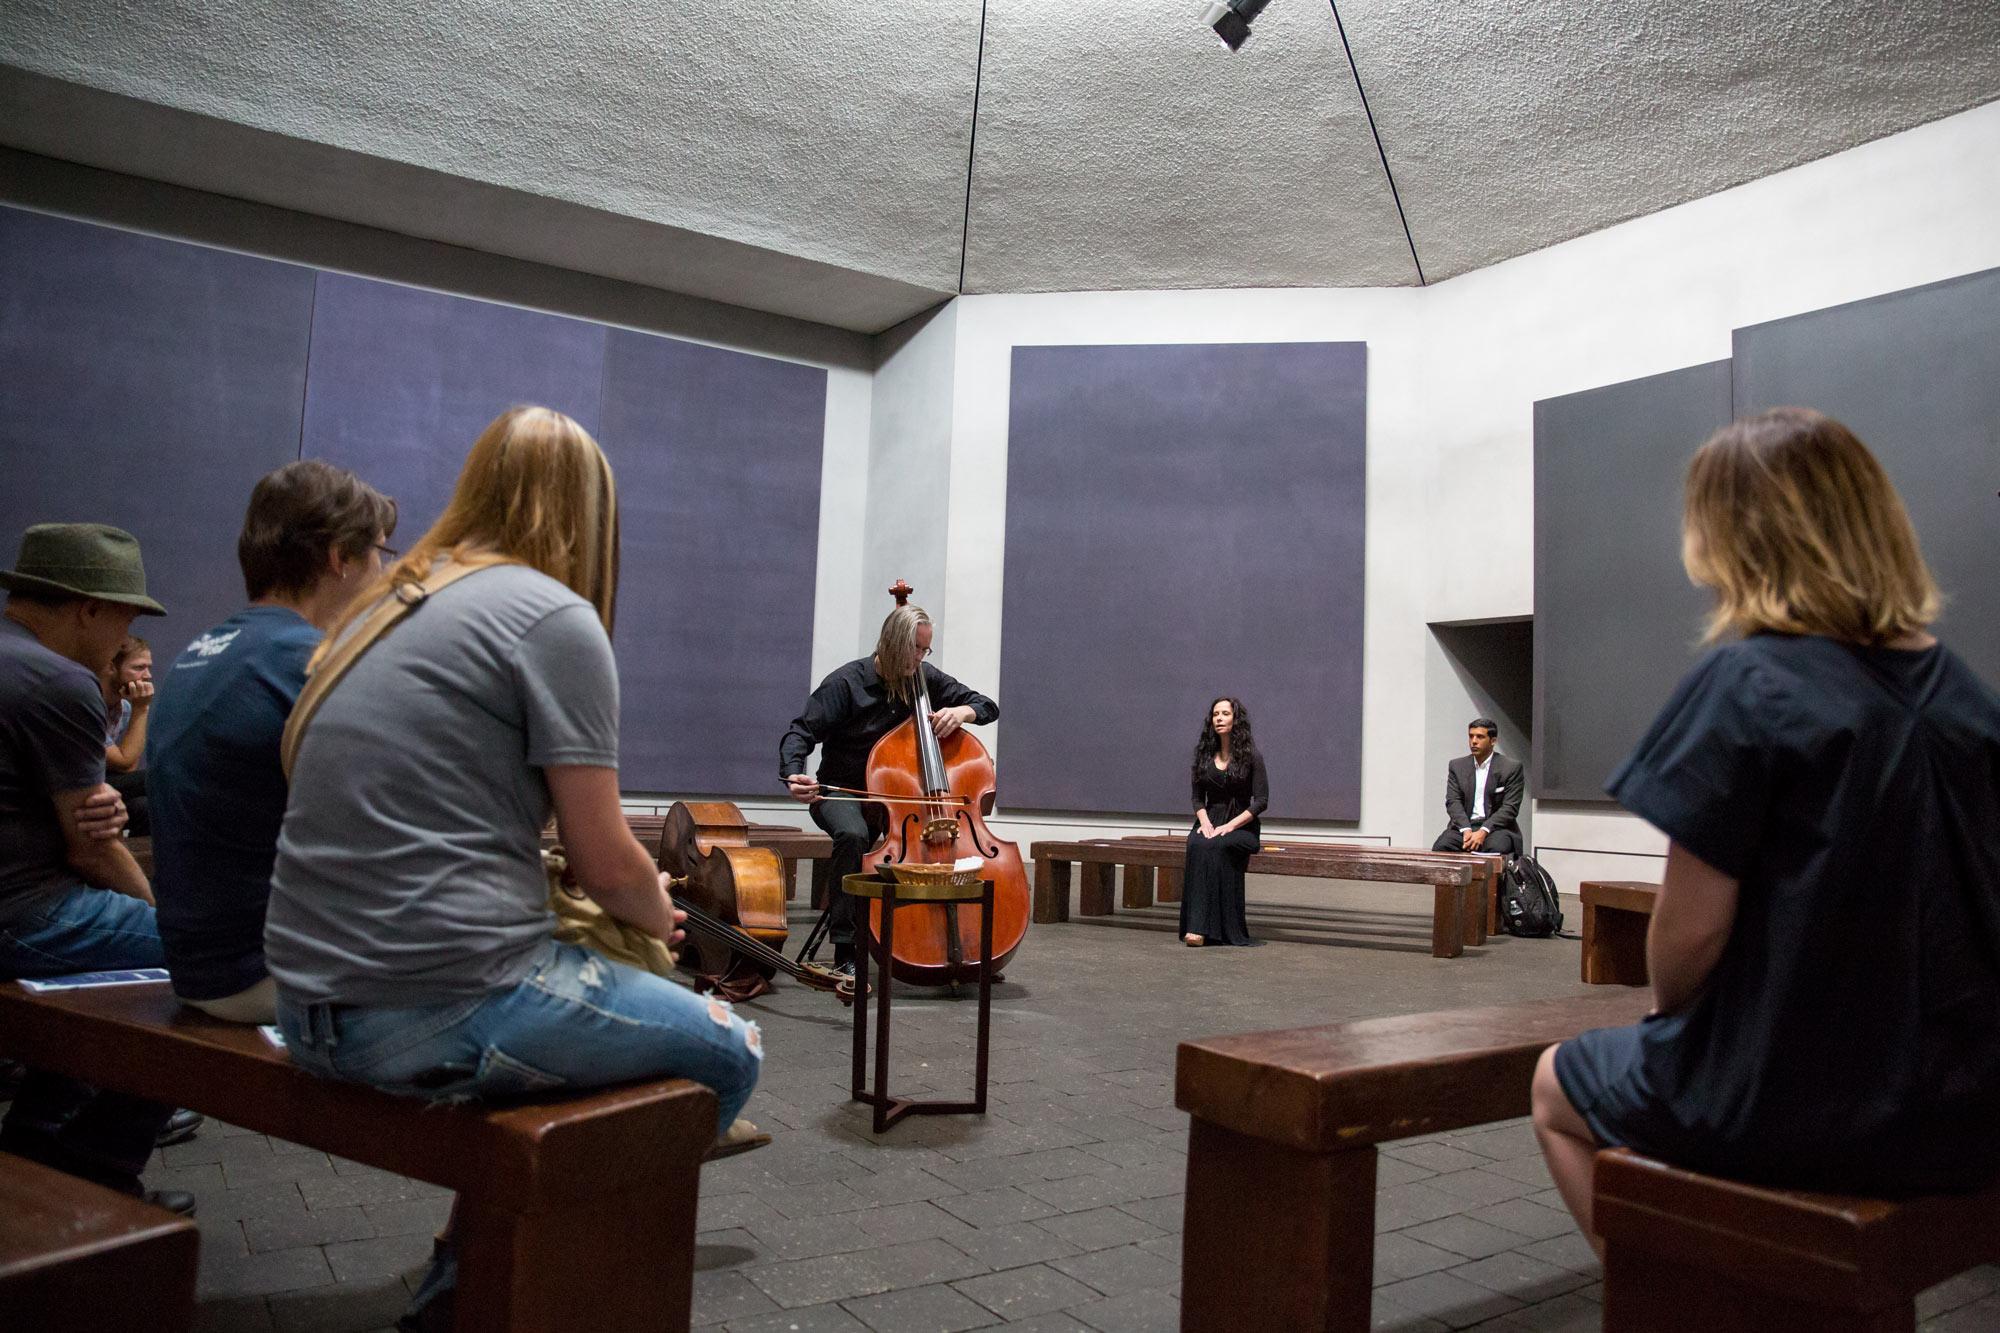 Anecdote of the Spirit at The Rothko Chapel. Misha Penton, soprano & concept. Thomas Helton, double bass. MenilFest 2017. Photo: Runaway Productions